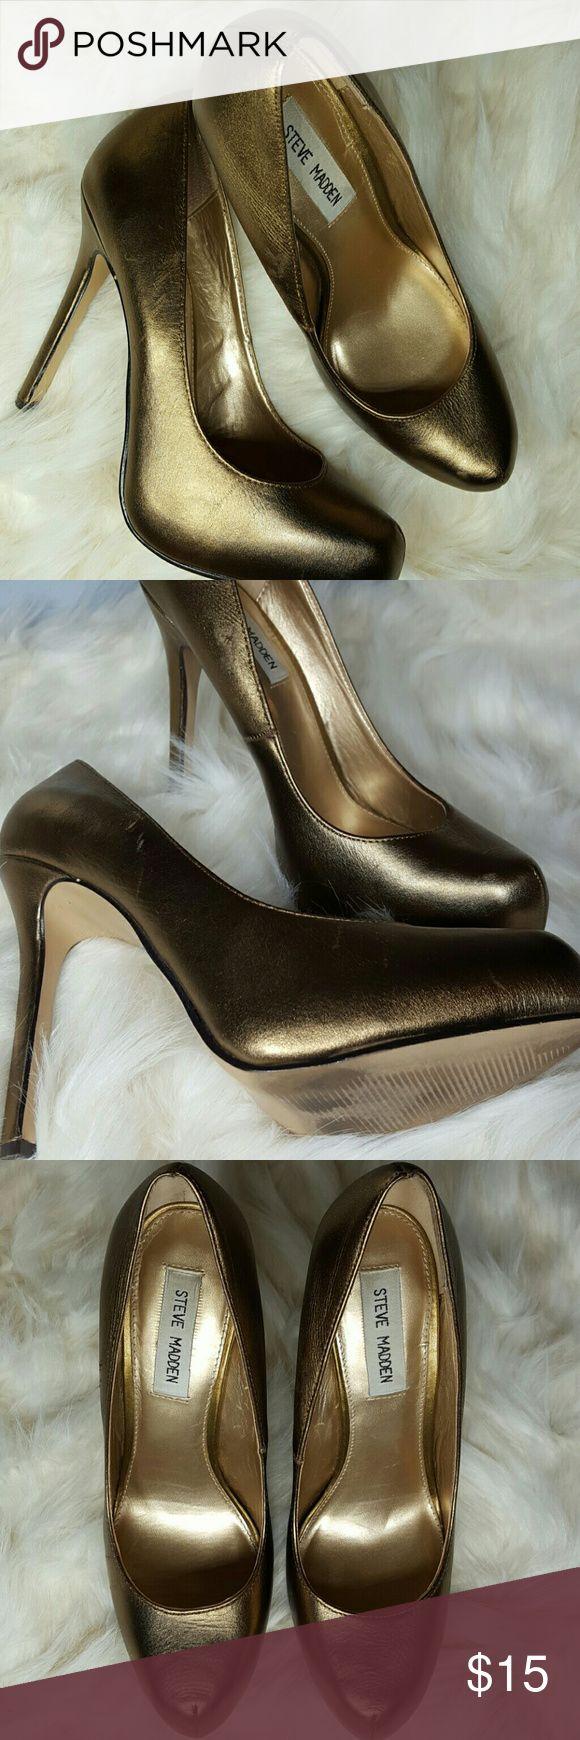 Bronze Steve Madden Heels Bronze metallic high heels by Steve Madden. Has a few dings but barely noticeable of the metallic material. Steve Madden Shoes Heels